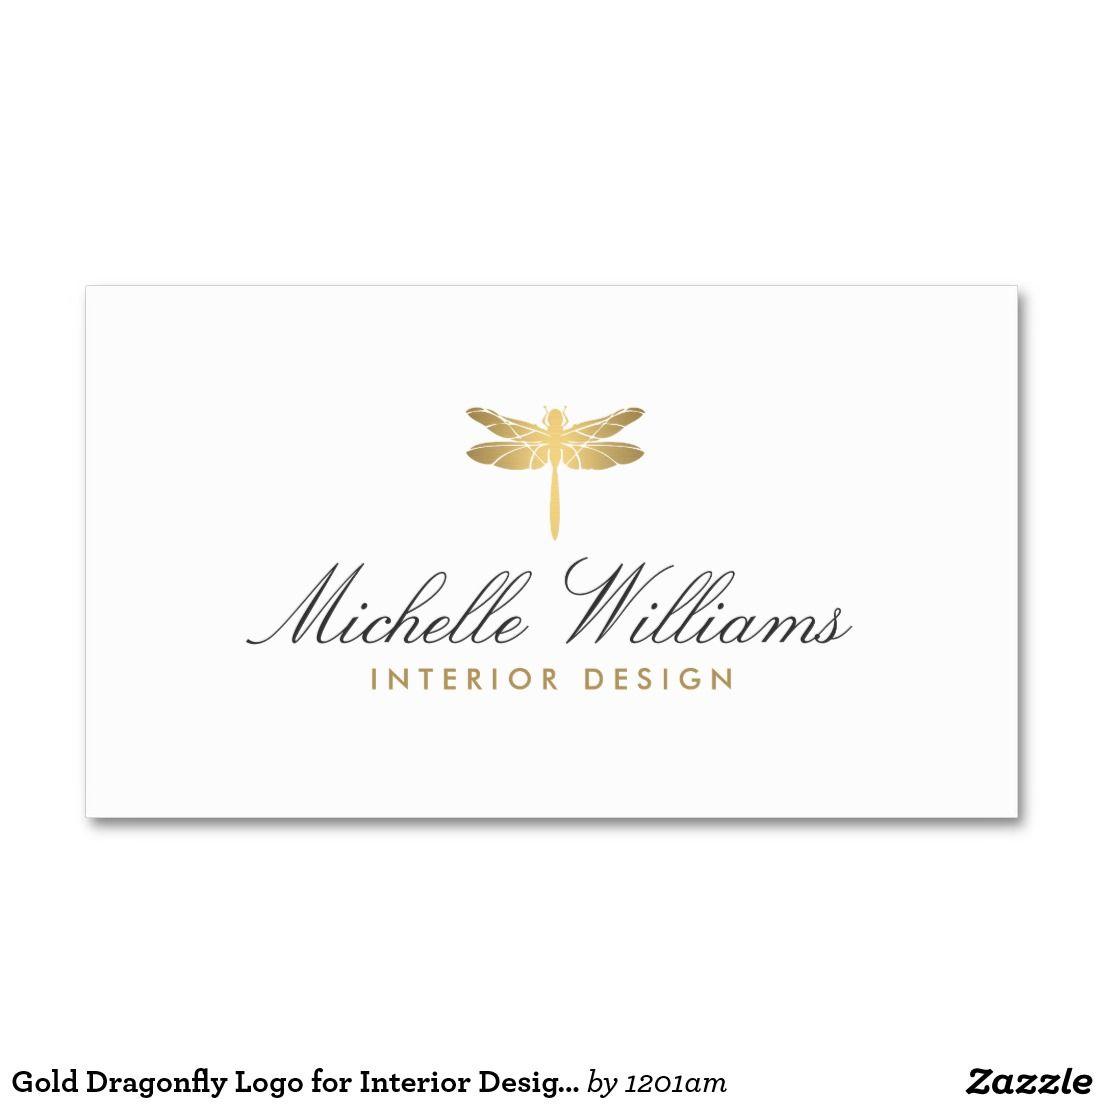 Gold Dragonfly Logo for Interior Designer Business Card ...